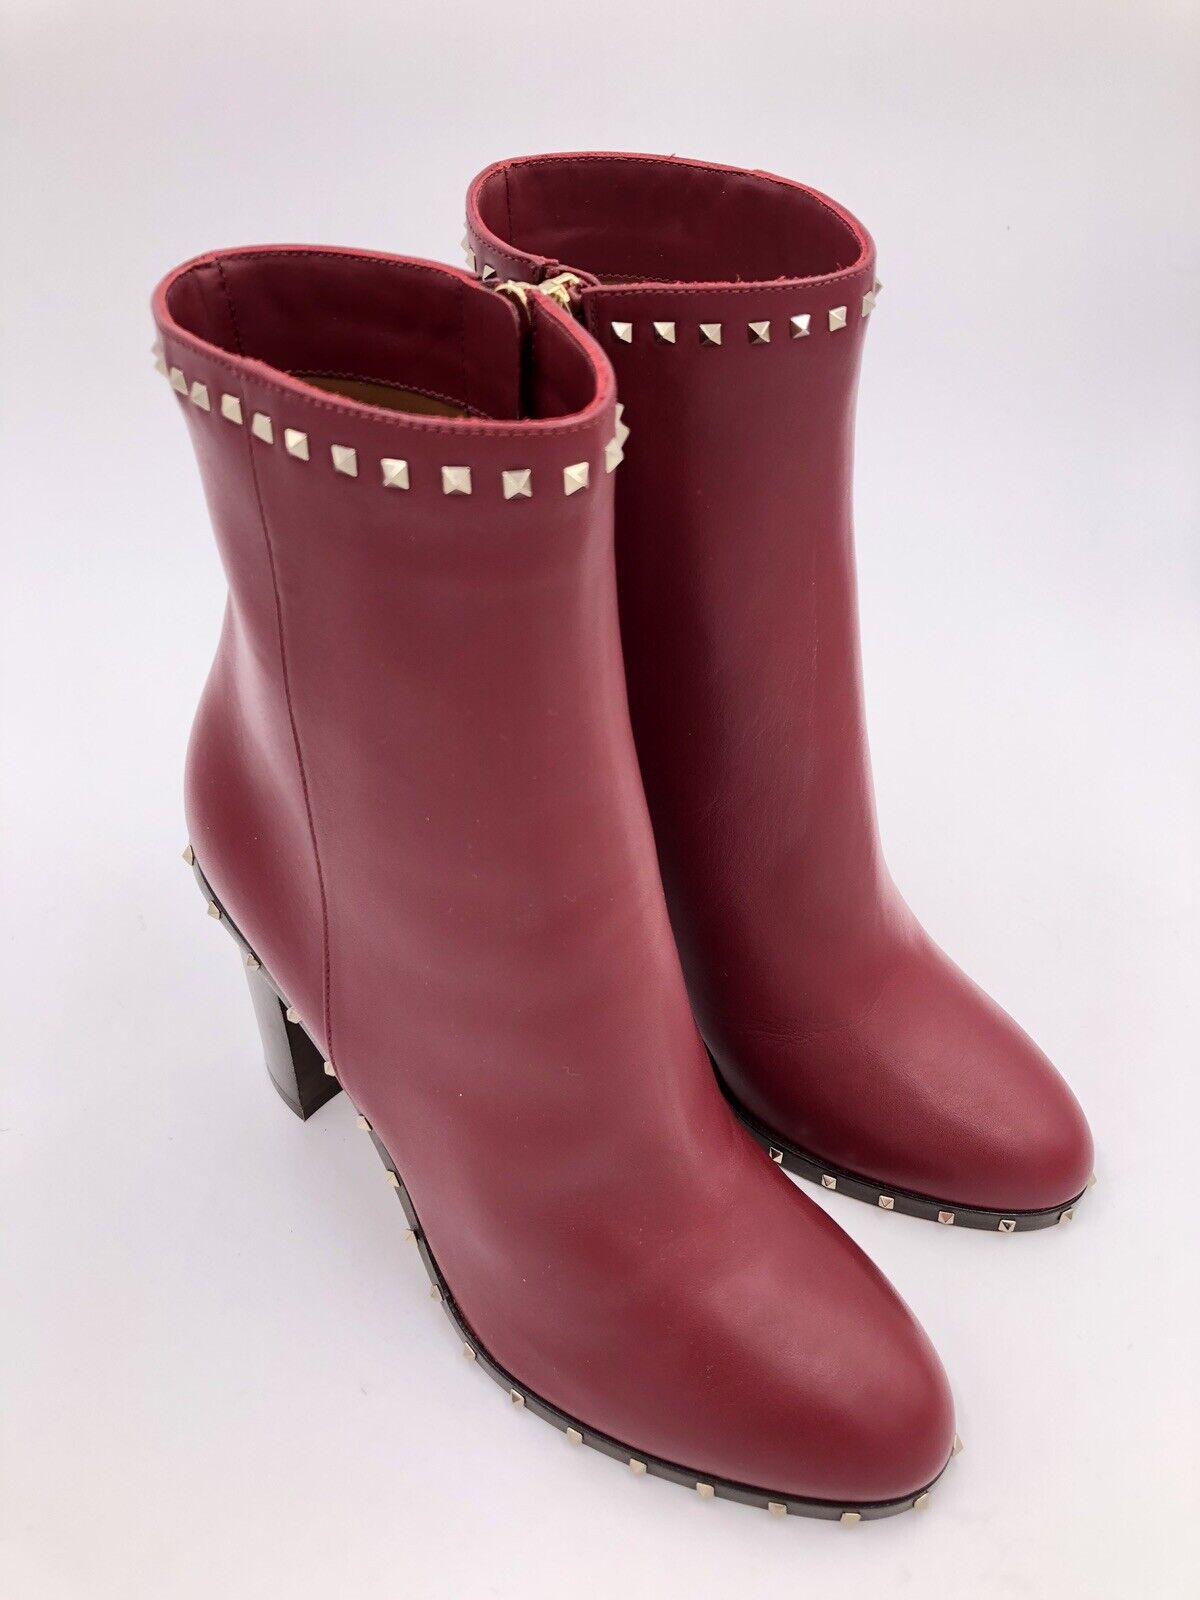 Valentino Garavani Ankle Stiefel Rockstud 37 Leder Bordeaux Gr. 37 Rockstud LP  1.050 EU NEU d27523